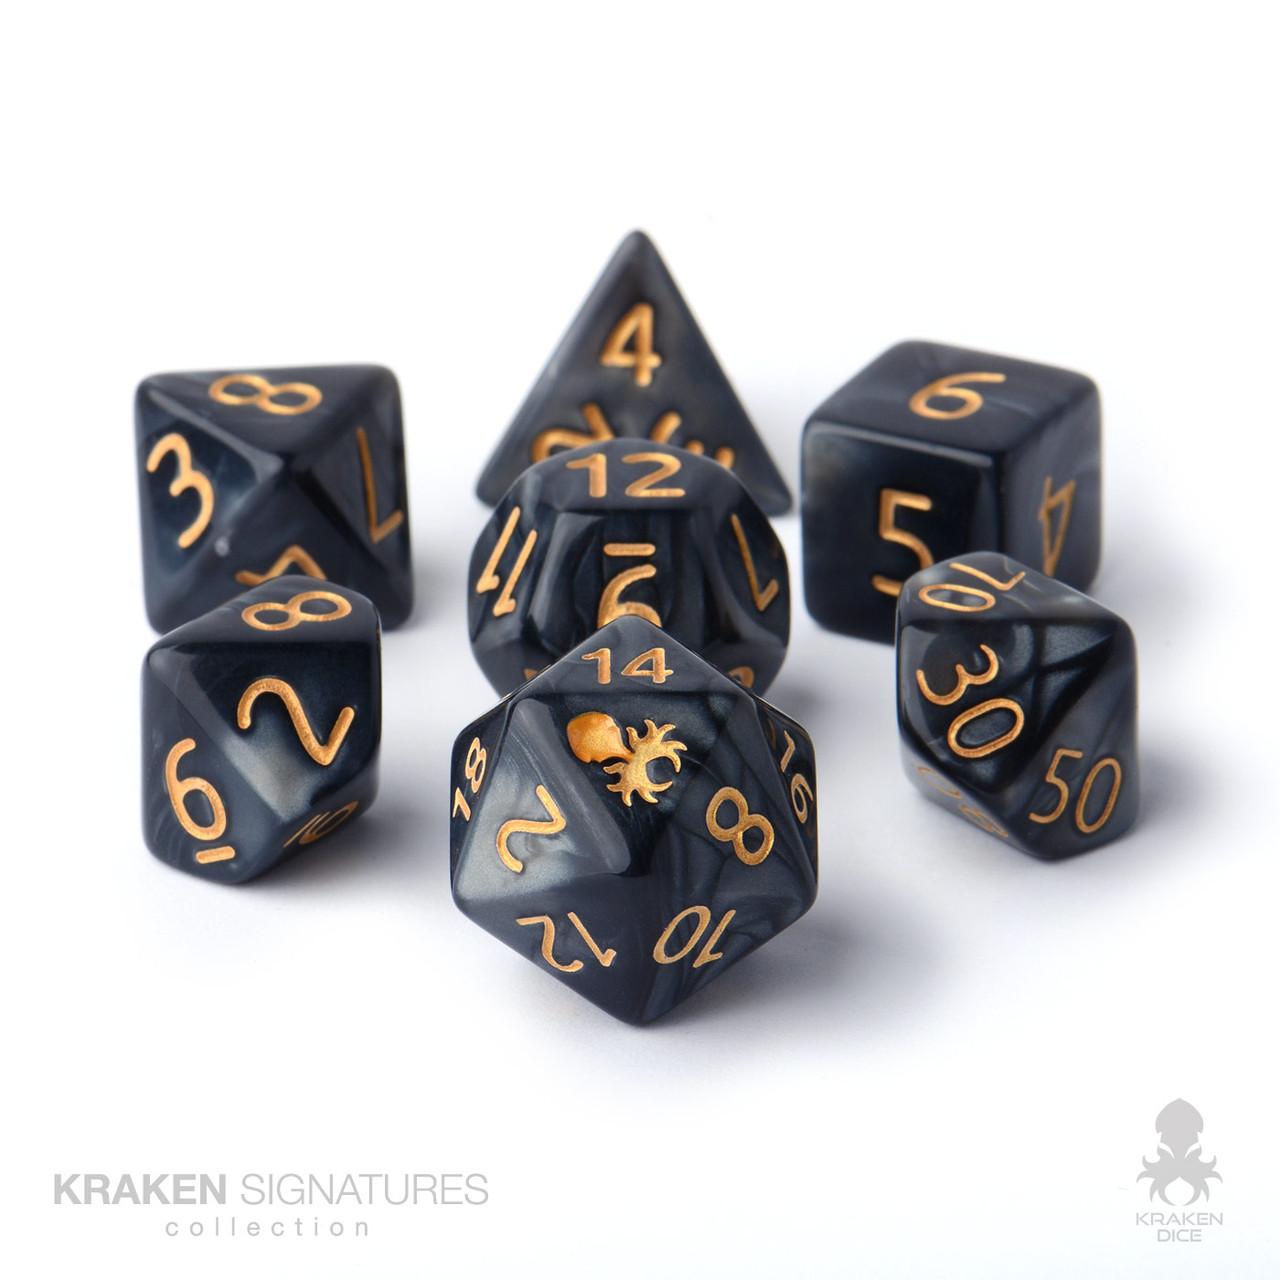 Kraken Signature's 7pc Black with Gold Ink Polyhedral RPG Dice Set